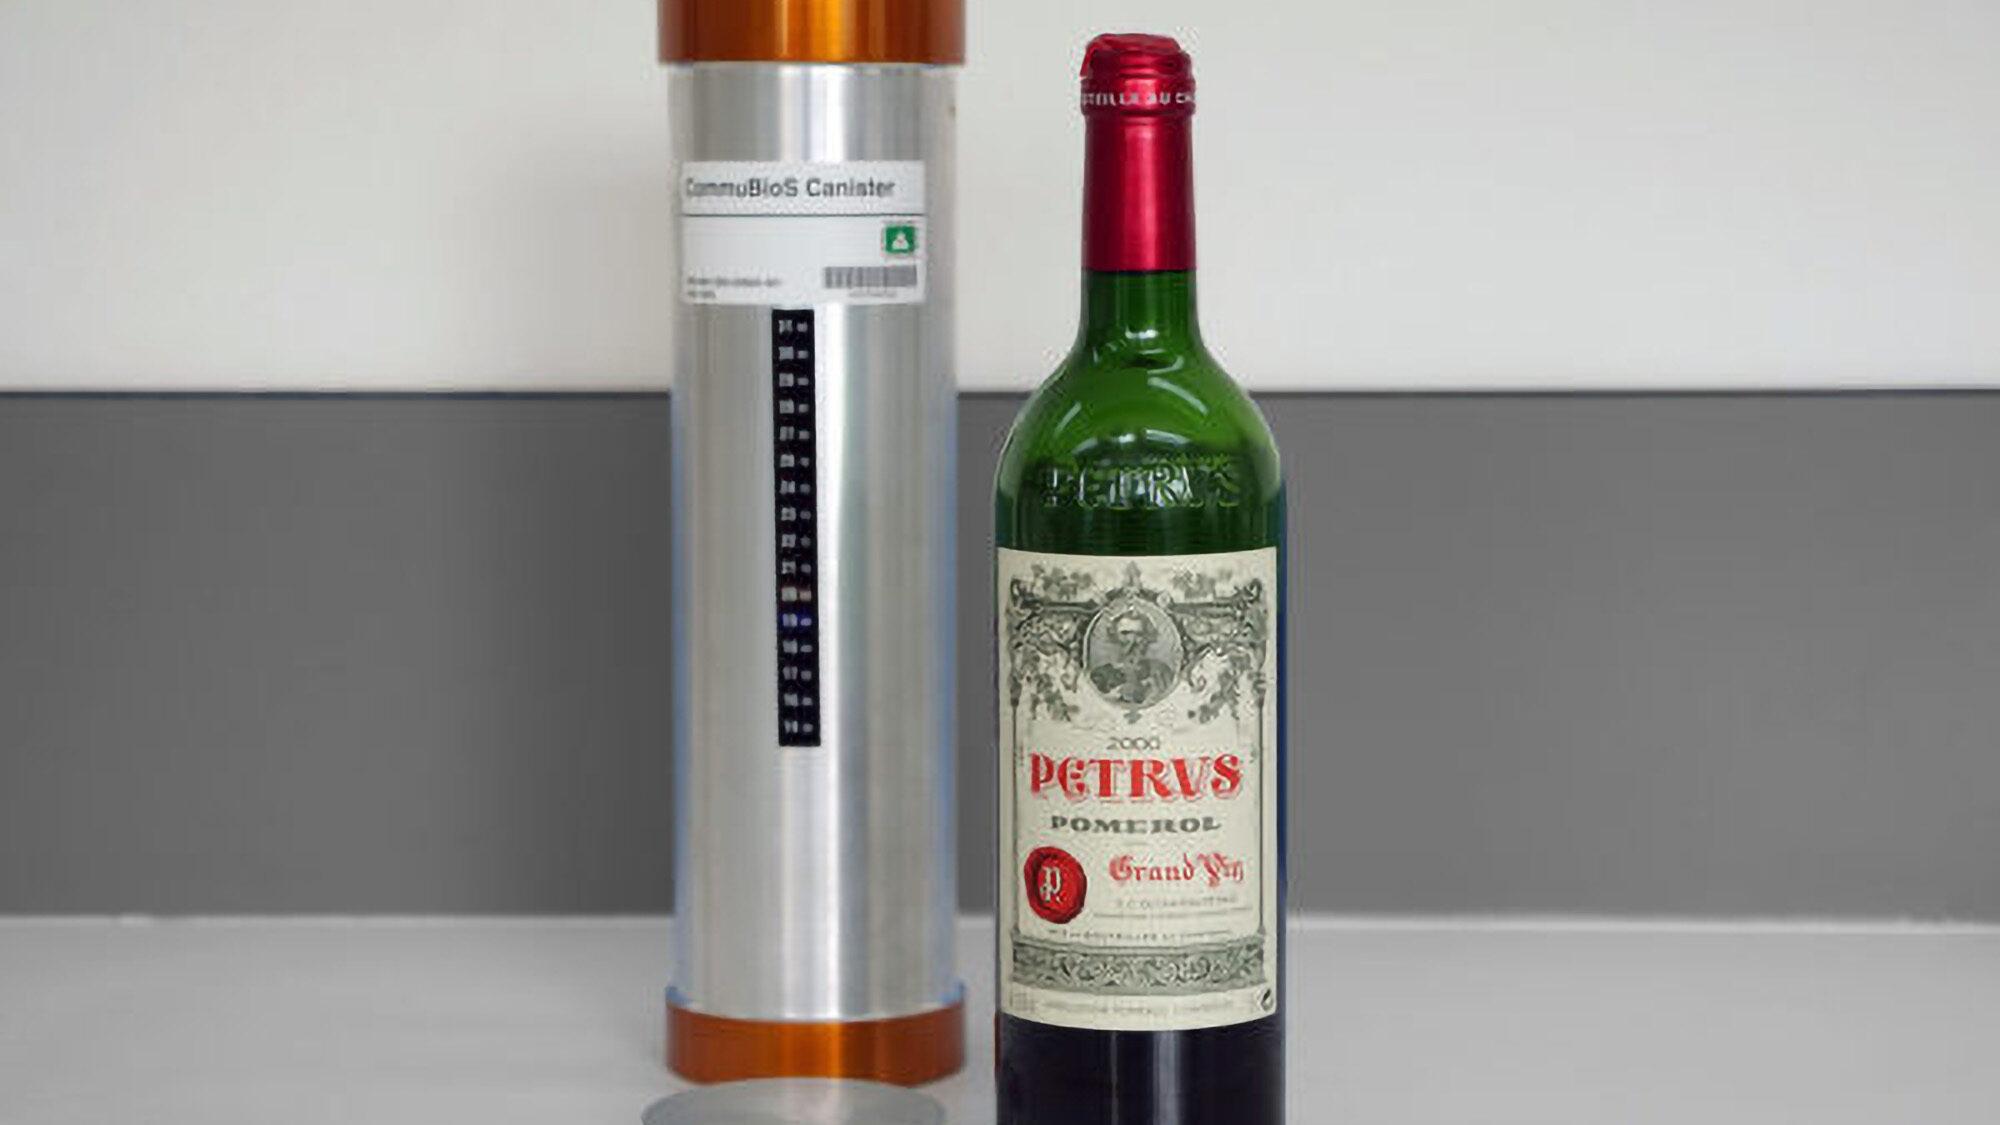 Space Aged: Fine Wine Taken Into Orbit Tastes Older, Say Experts